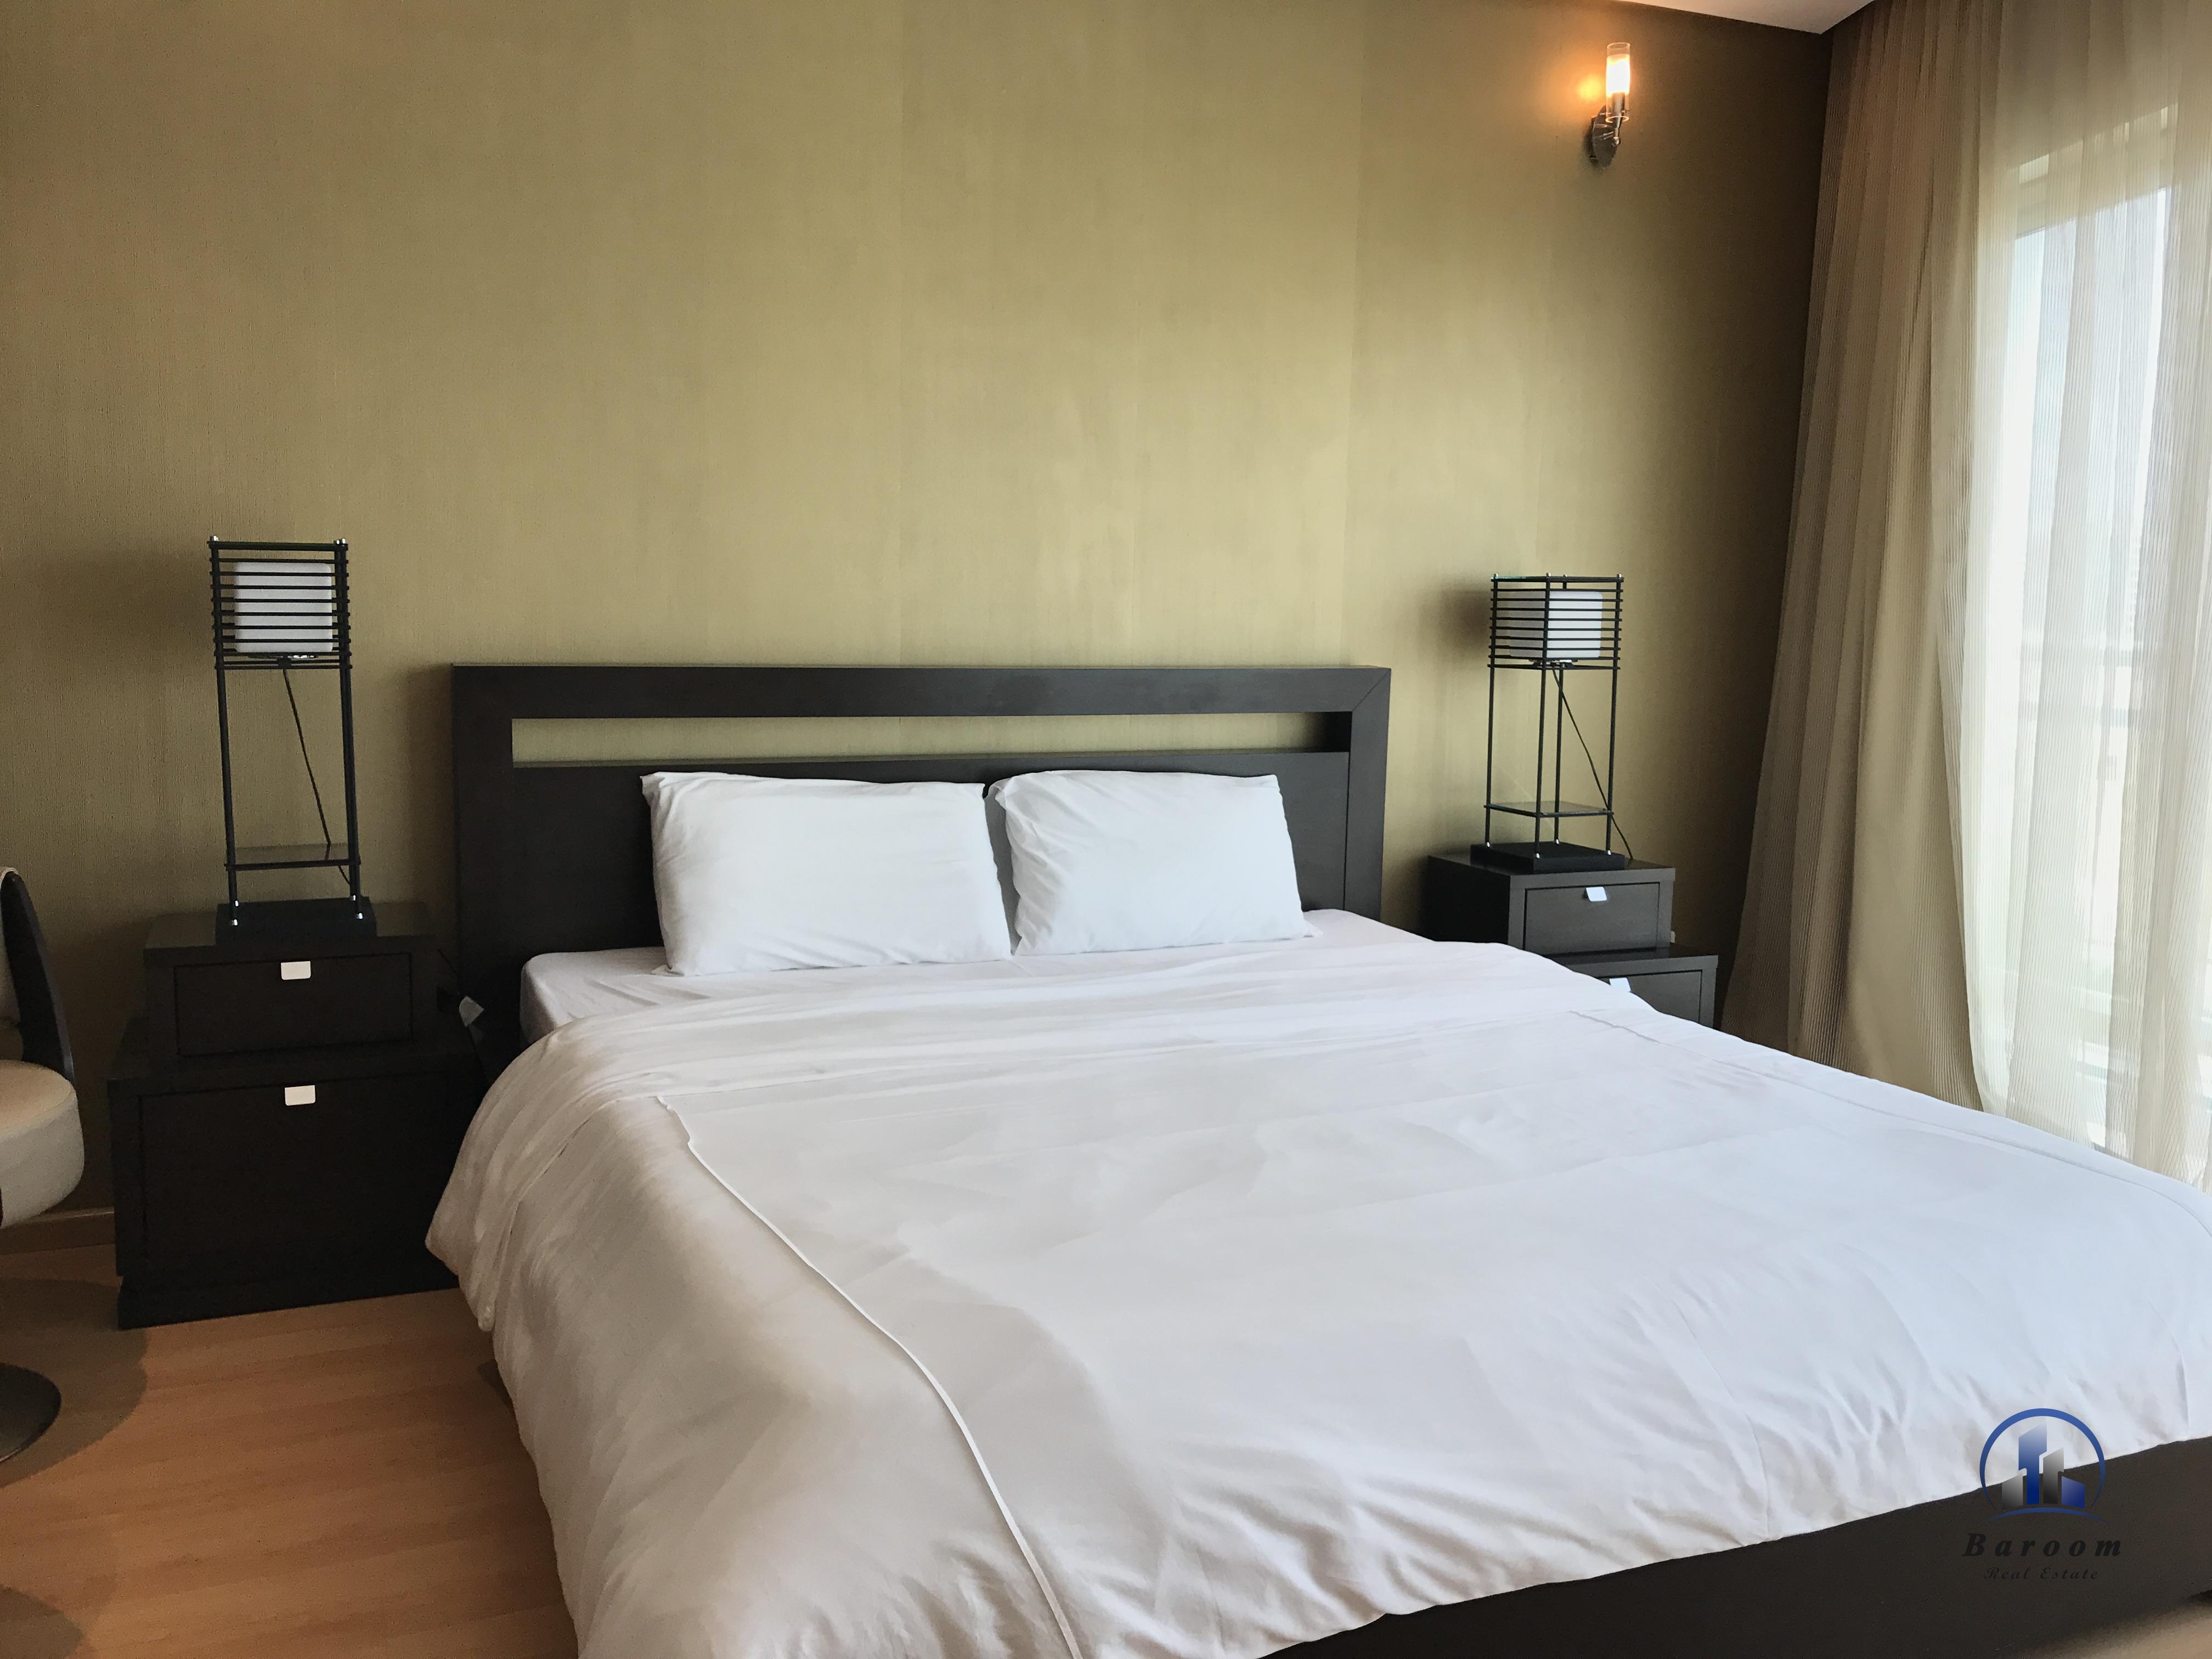 Two Bedroom Duplex Apartment8